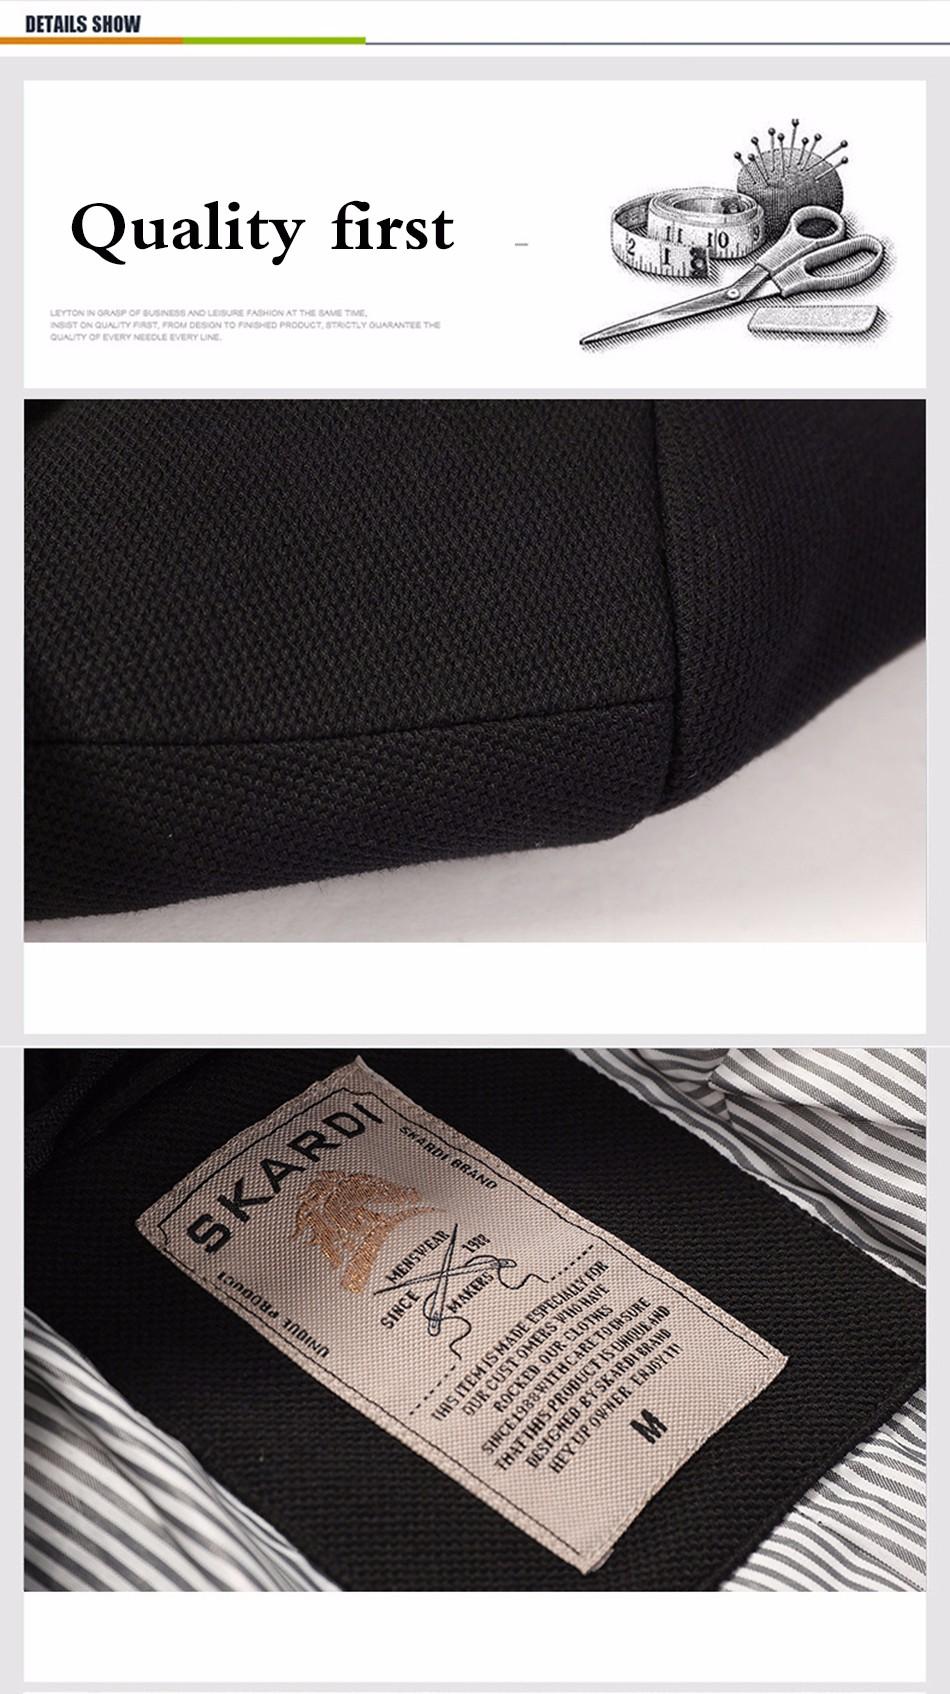 HTB1yS9IOVXXXXb6XXXXq6xXFXXXX - Men Casual Warm Coats Size M-3XL Good Quality Single Breasted Design Thicken Men's Fashion Wool Clothings Lapel Design hsd-J316